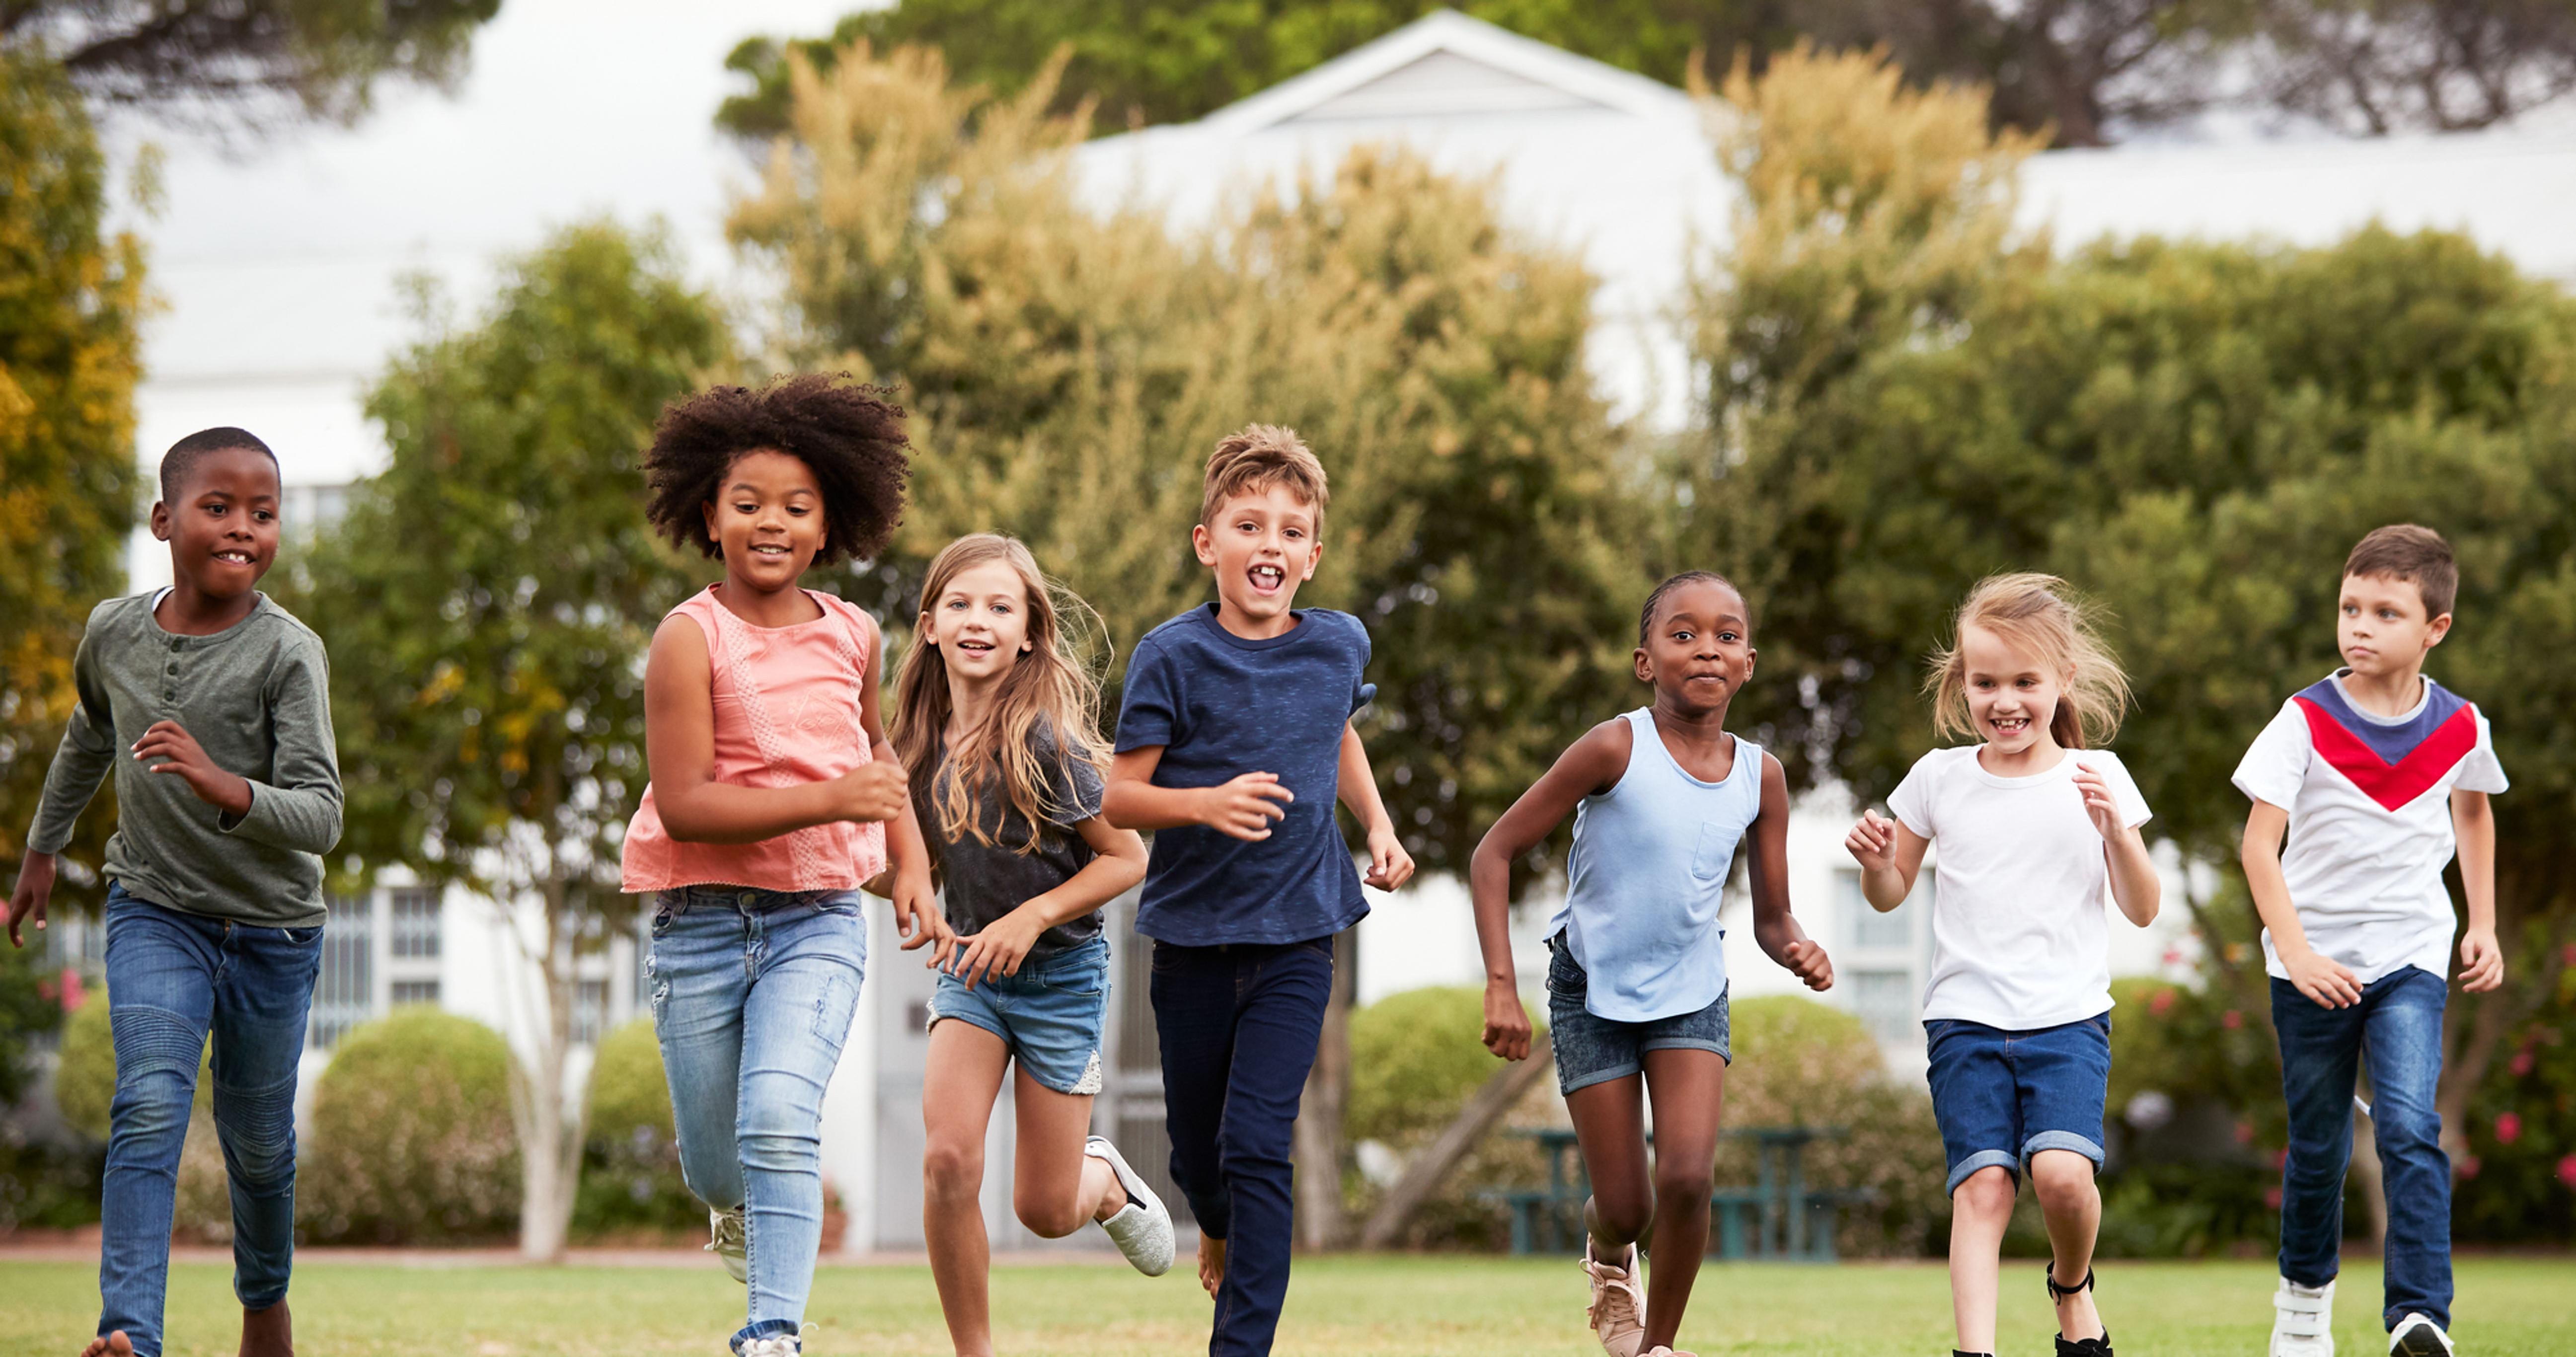 Kids Kick Covid: Ages 6-10